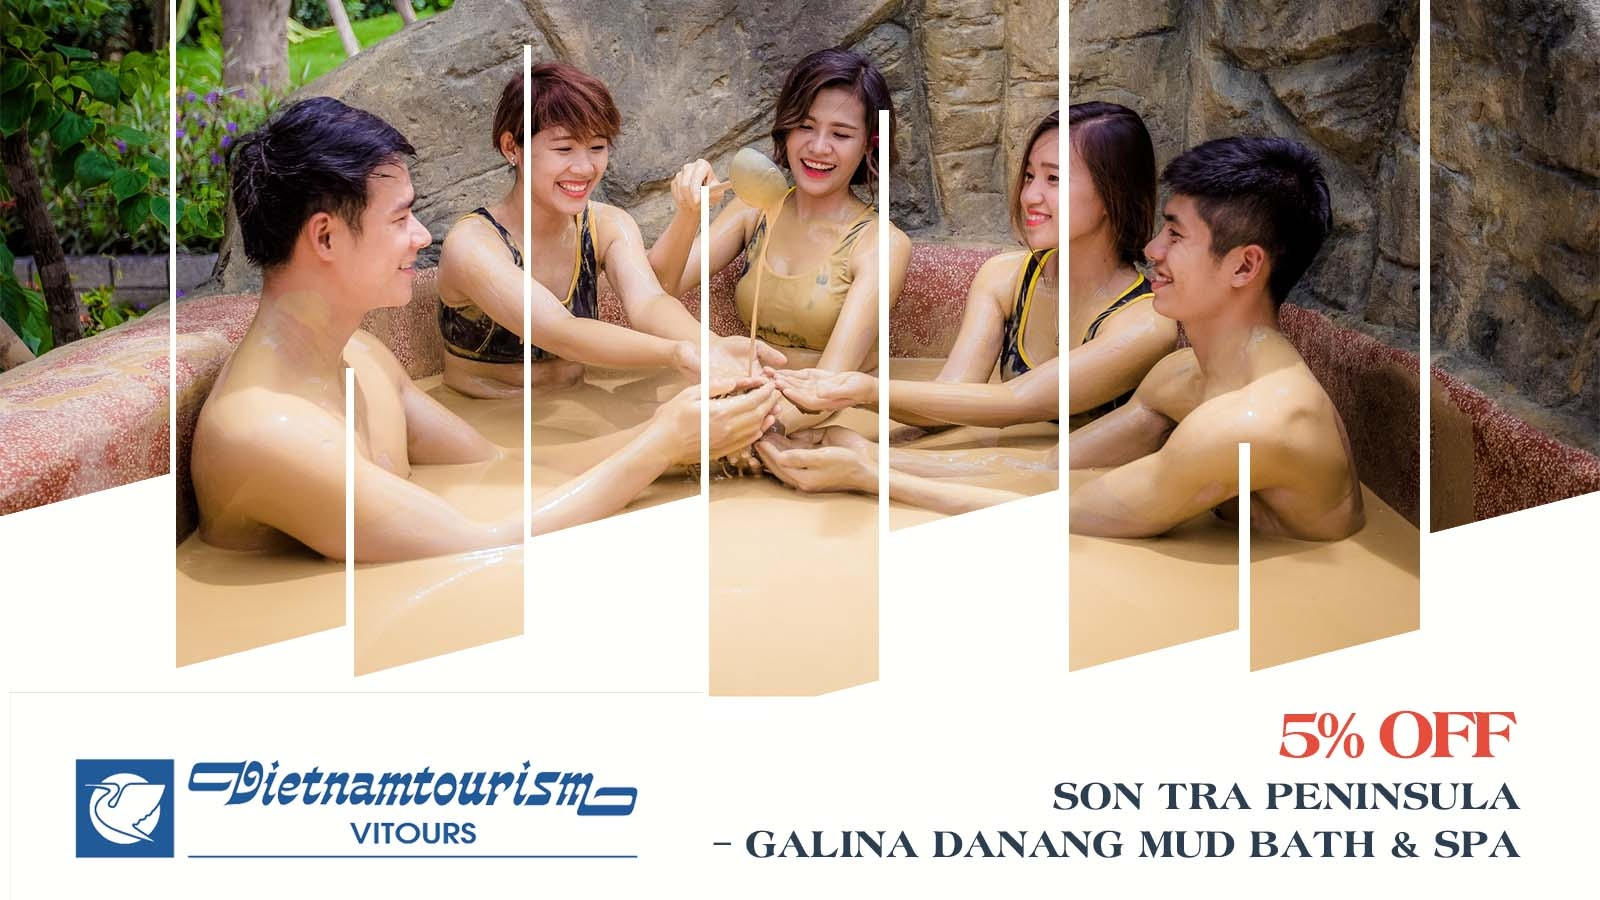 Vitours 5% OFF Son Tra Peninsula – Galina Danang Mud Bath & Spa 1